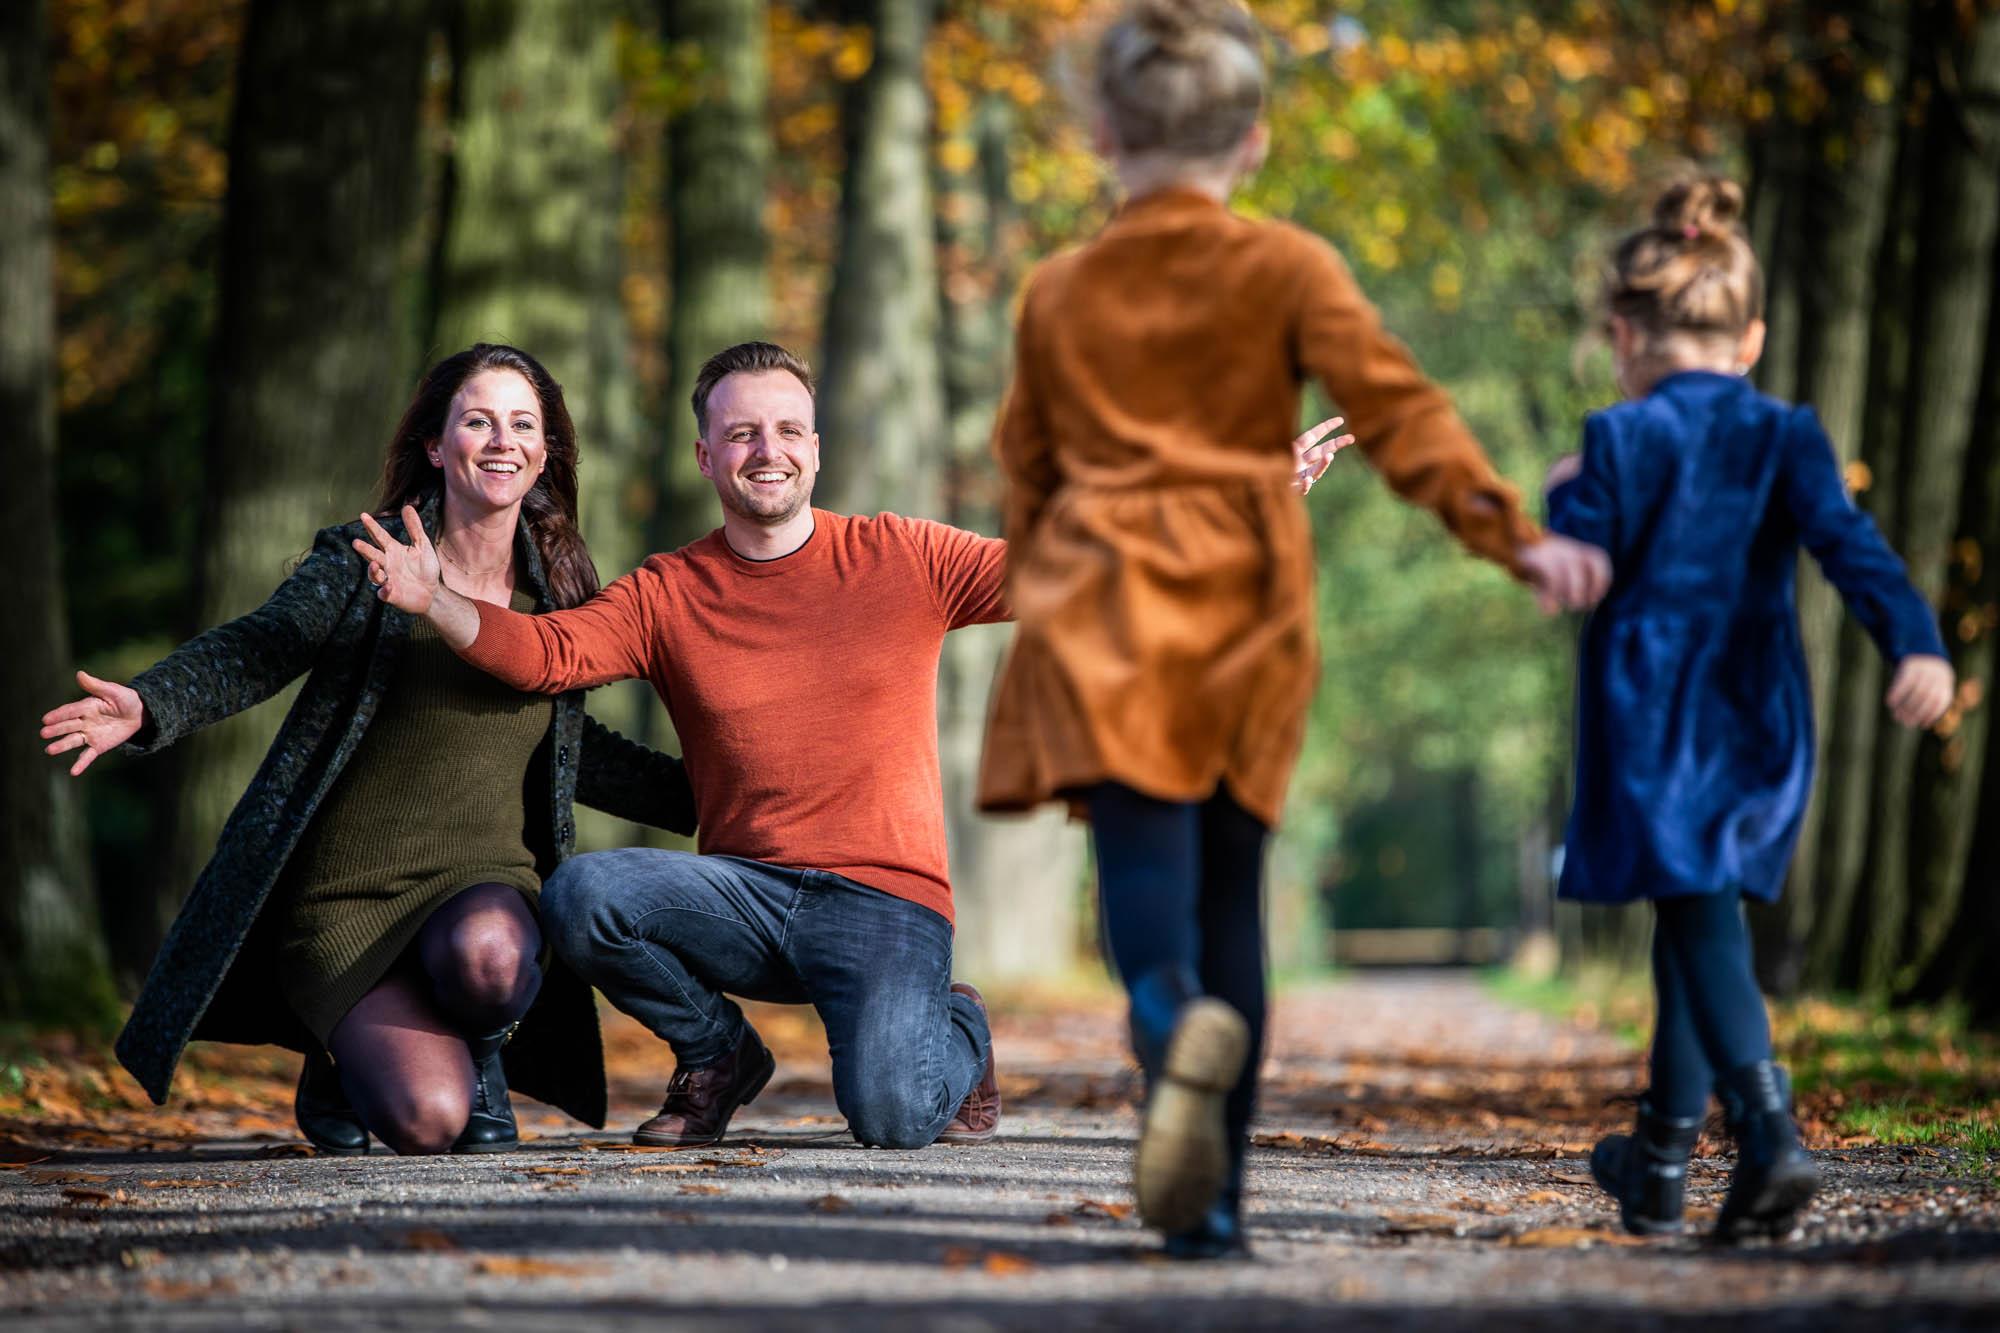 Spontane familie fotoreportage in de herfst.